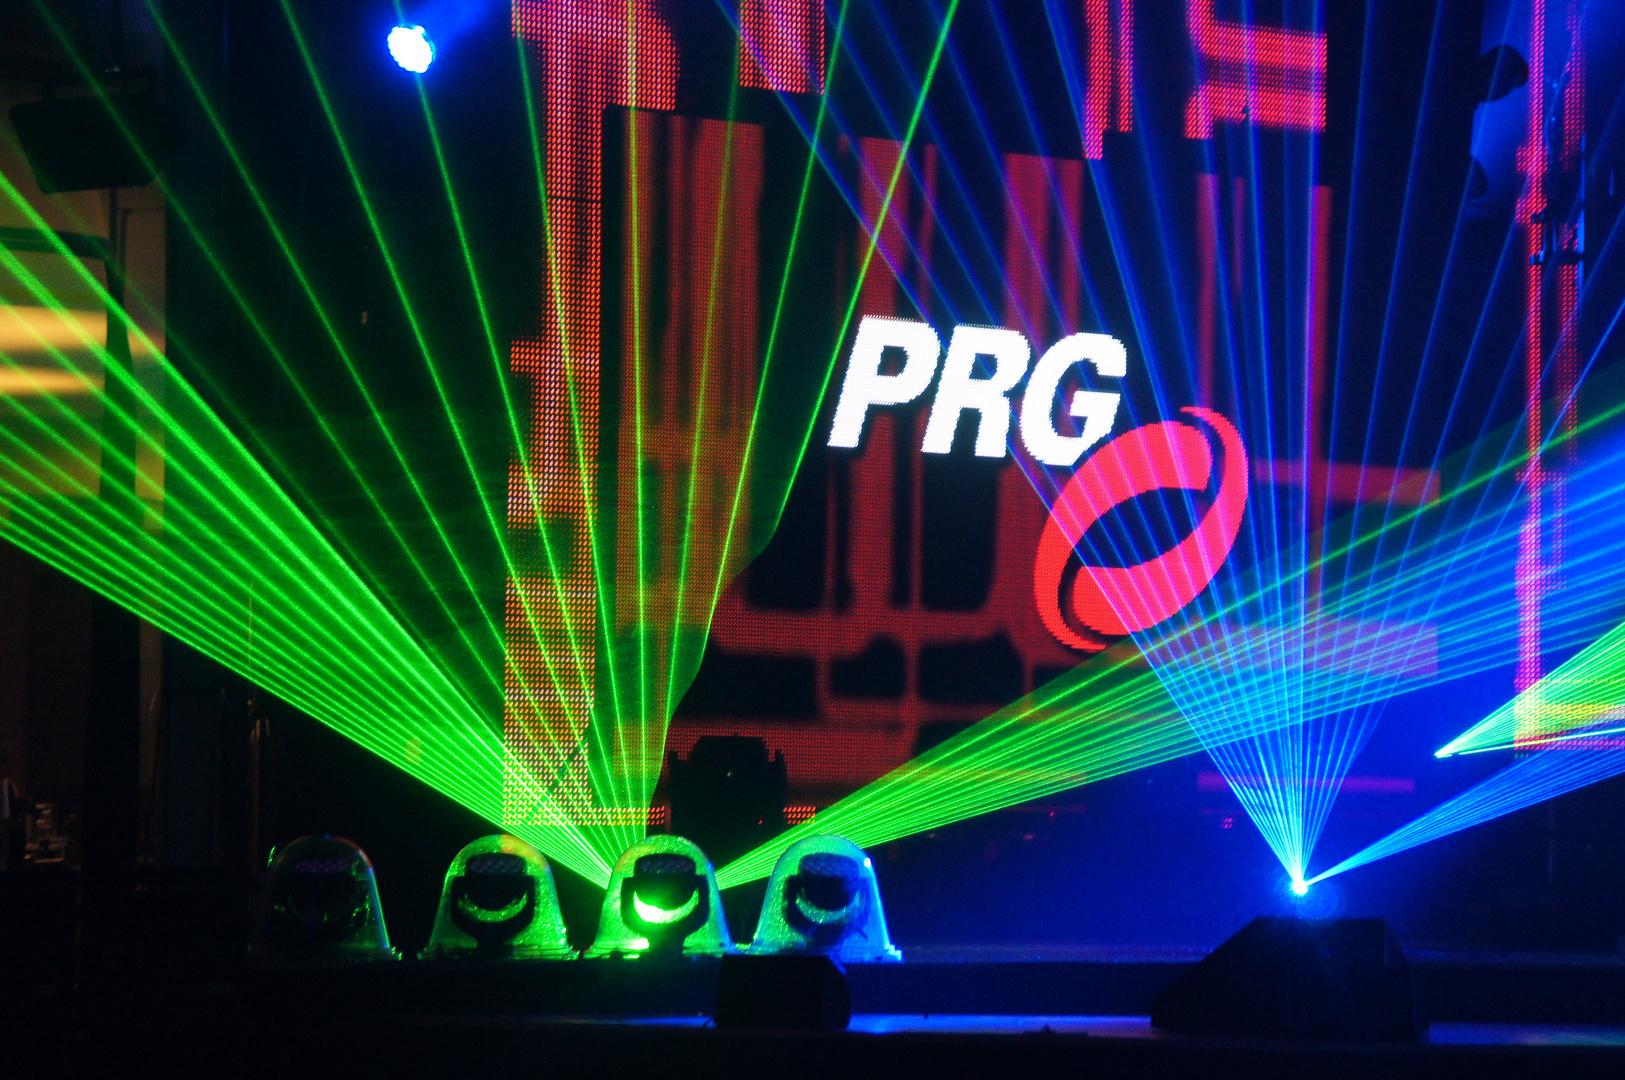 PRG Light and Sound Show: Laser (2)